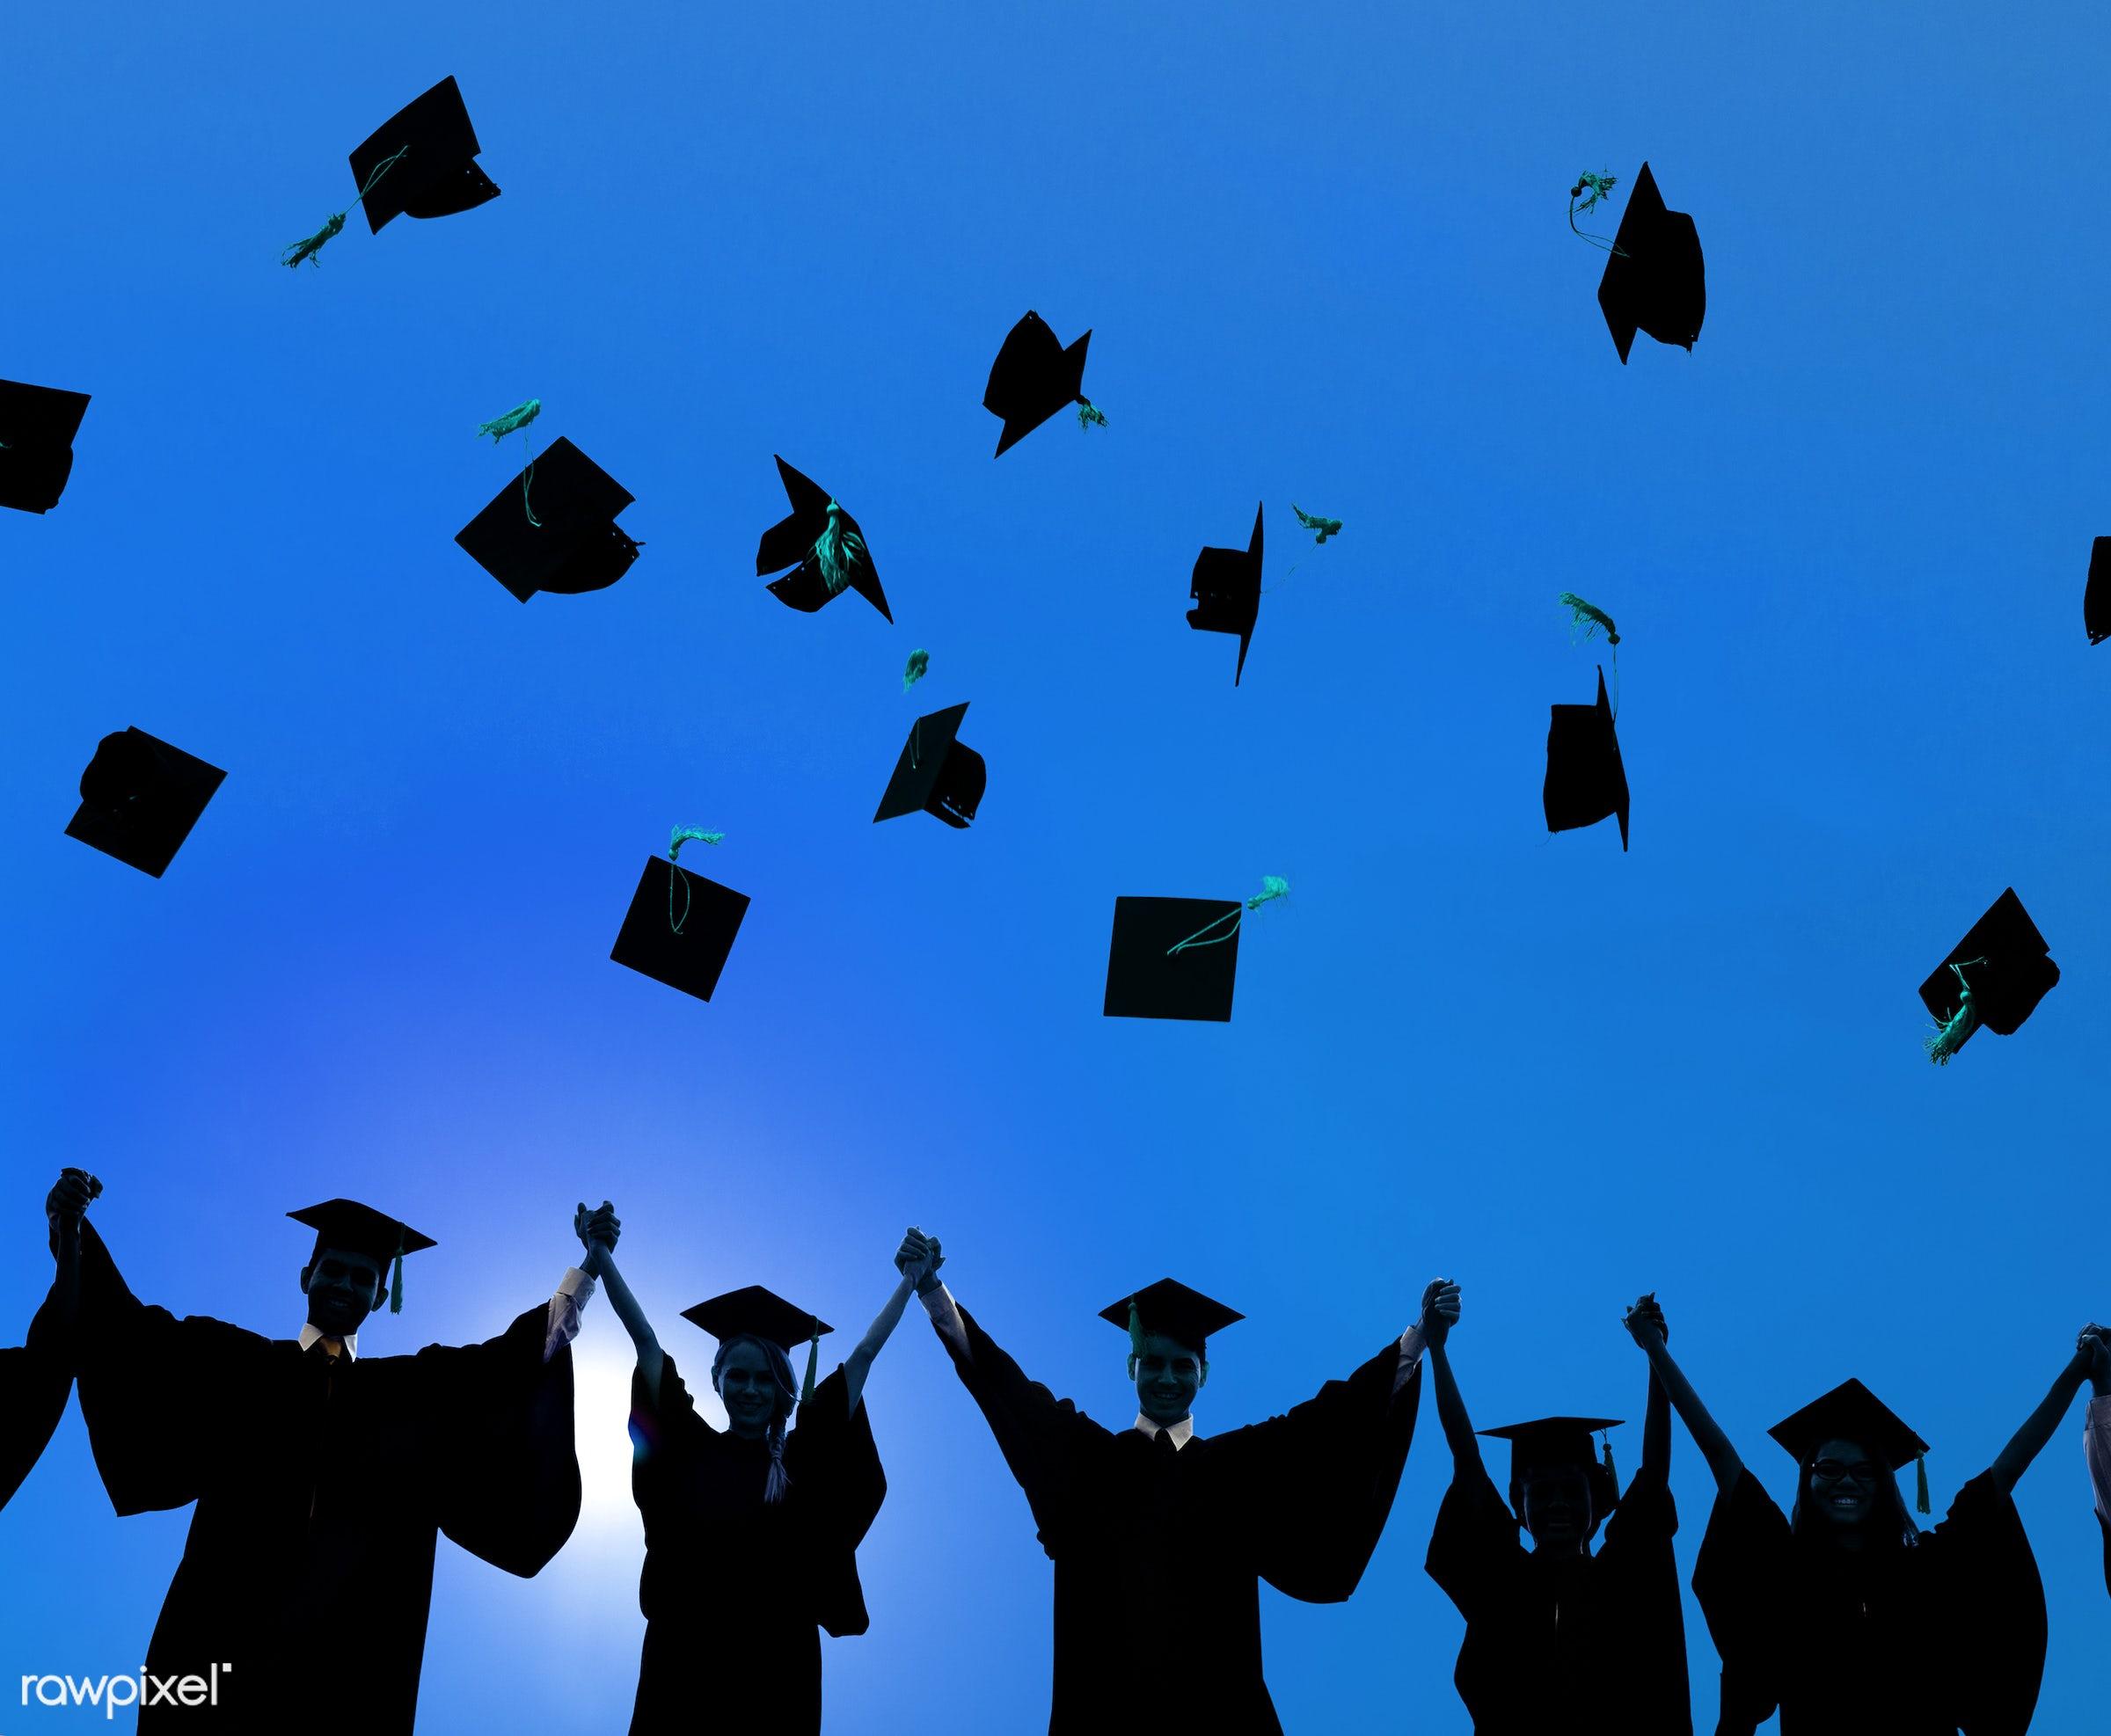 hat, academic, achievement, arms raised, campus, cap, celebration, ceremony, certificate, cheerful, college, college student...